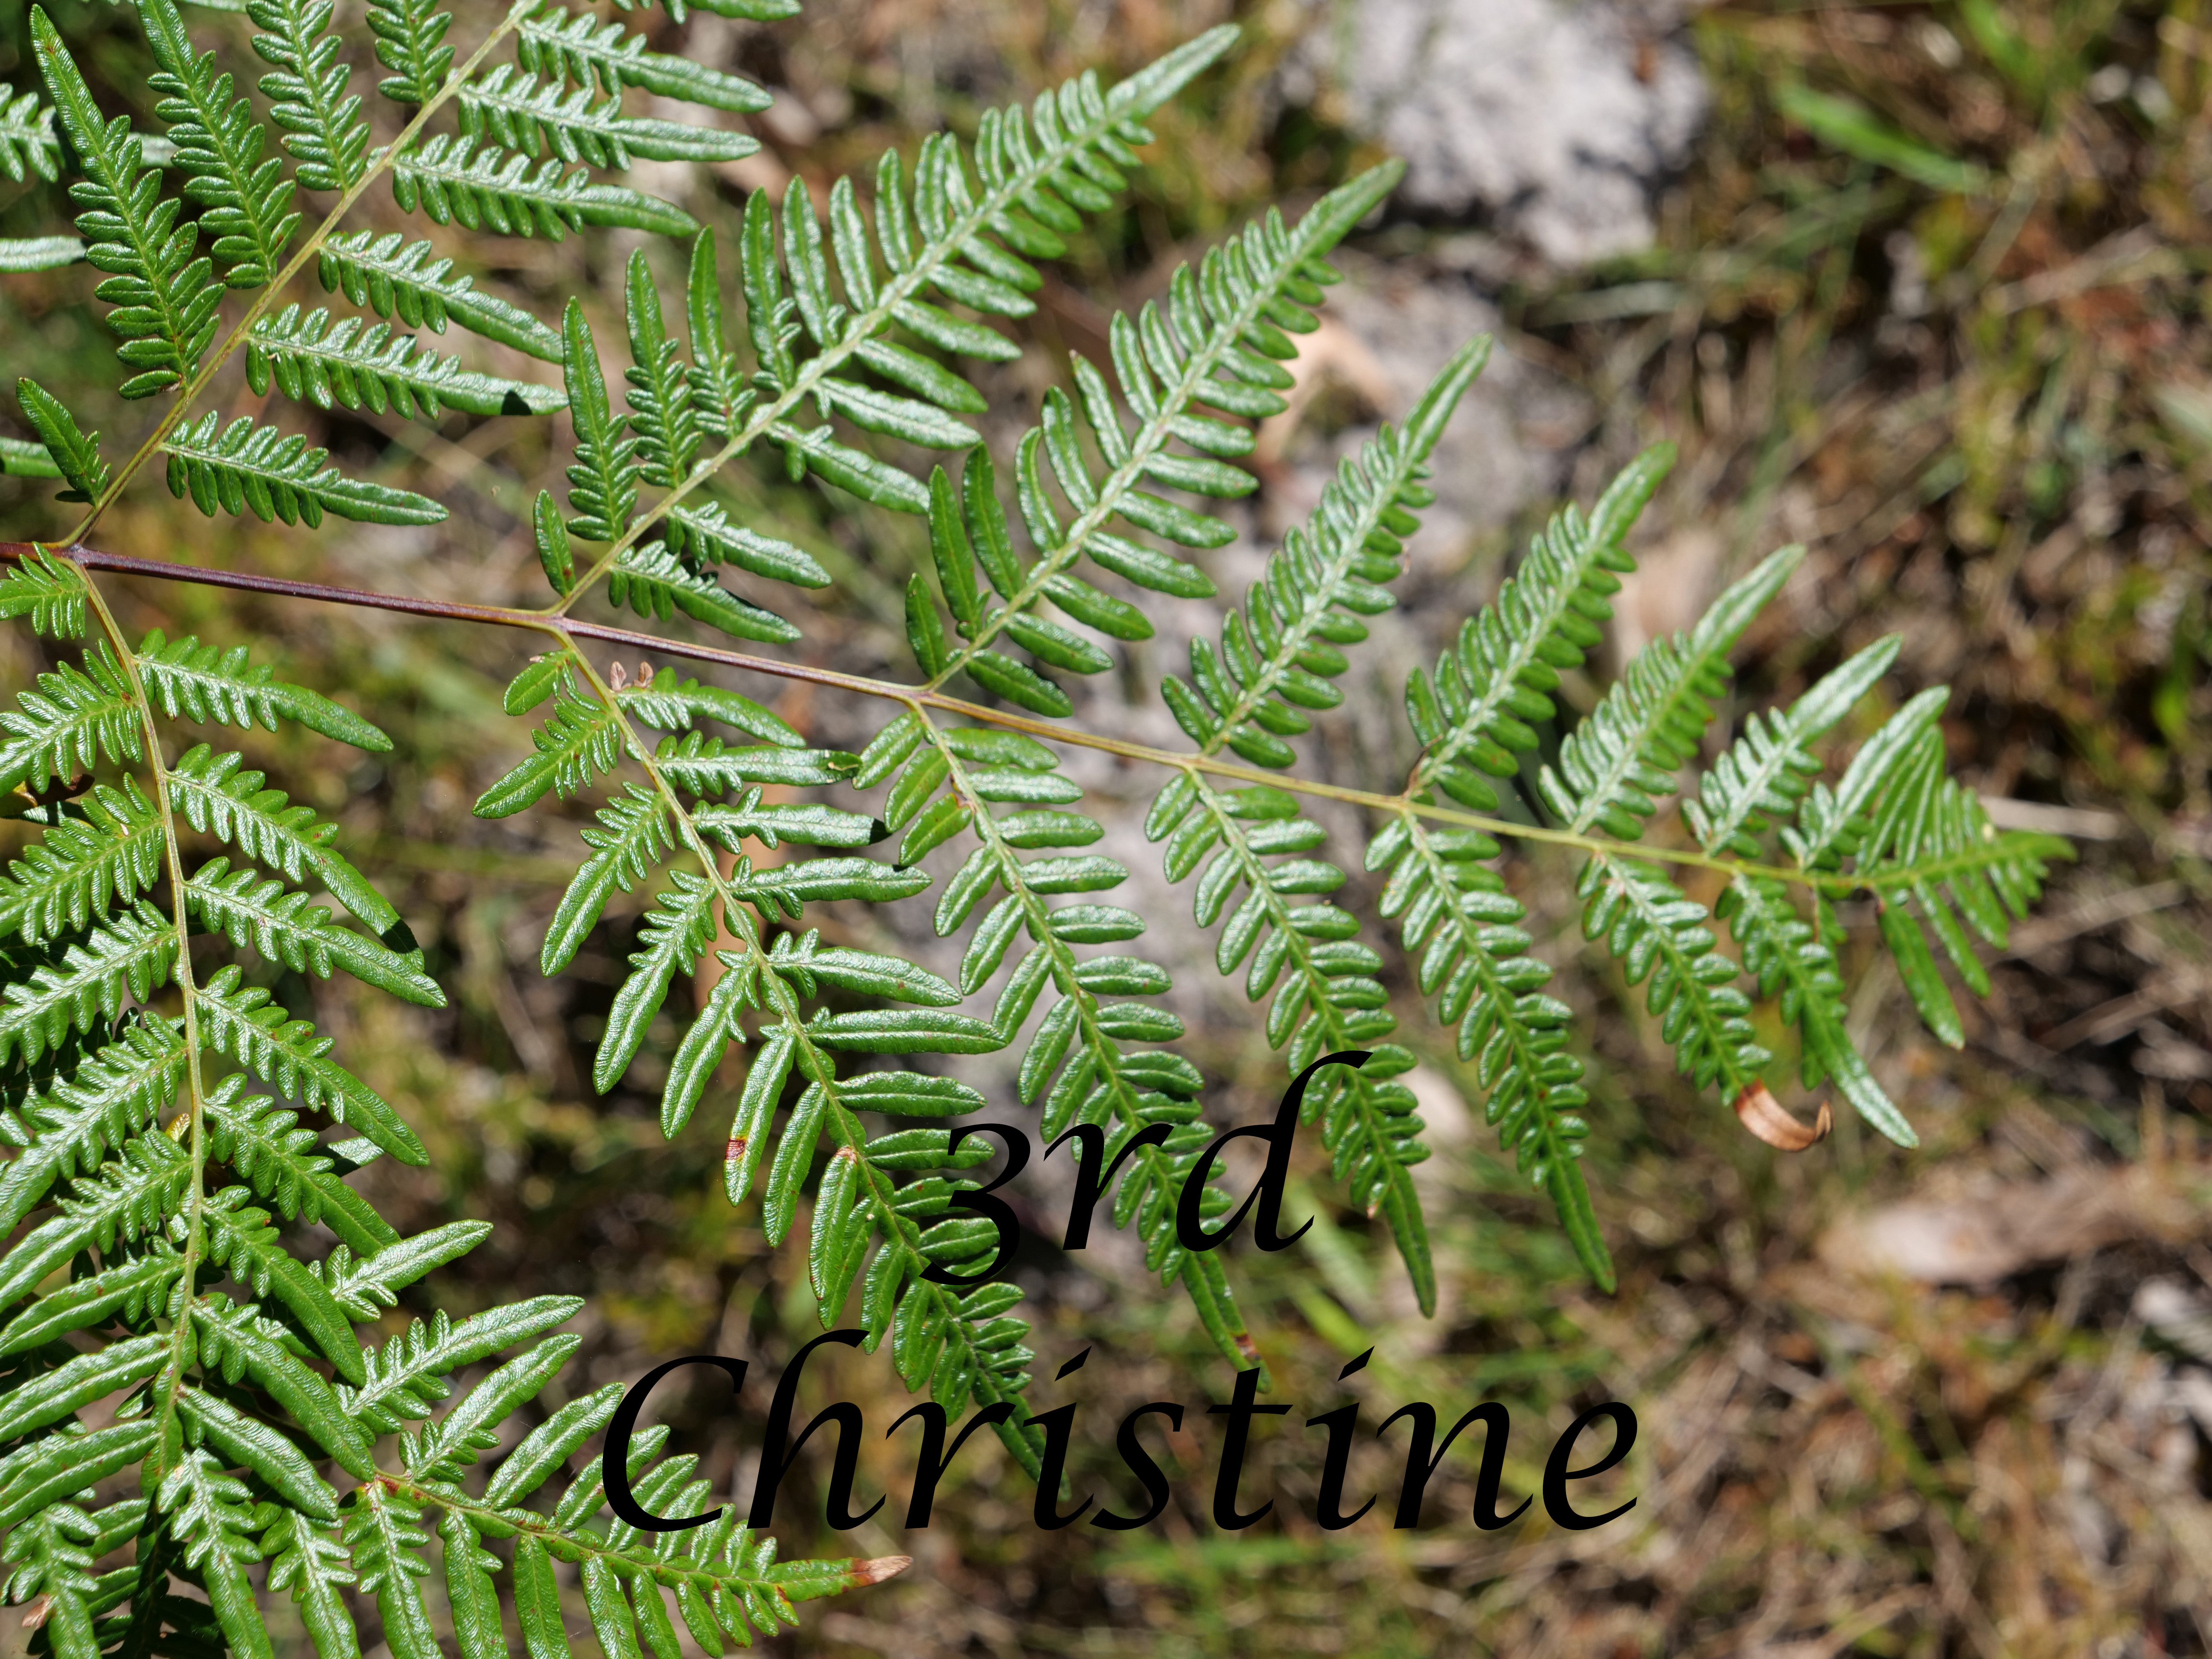 Leaves 3rd Christine